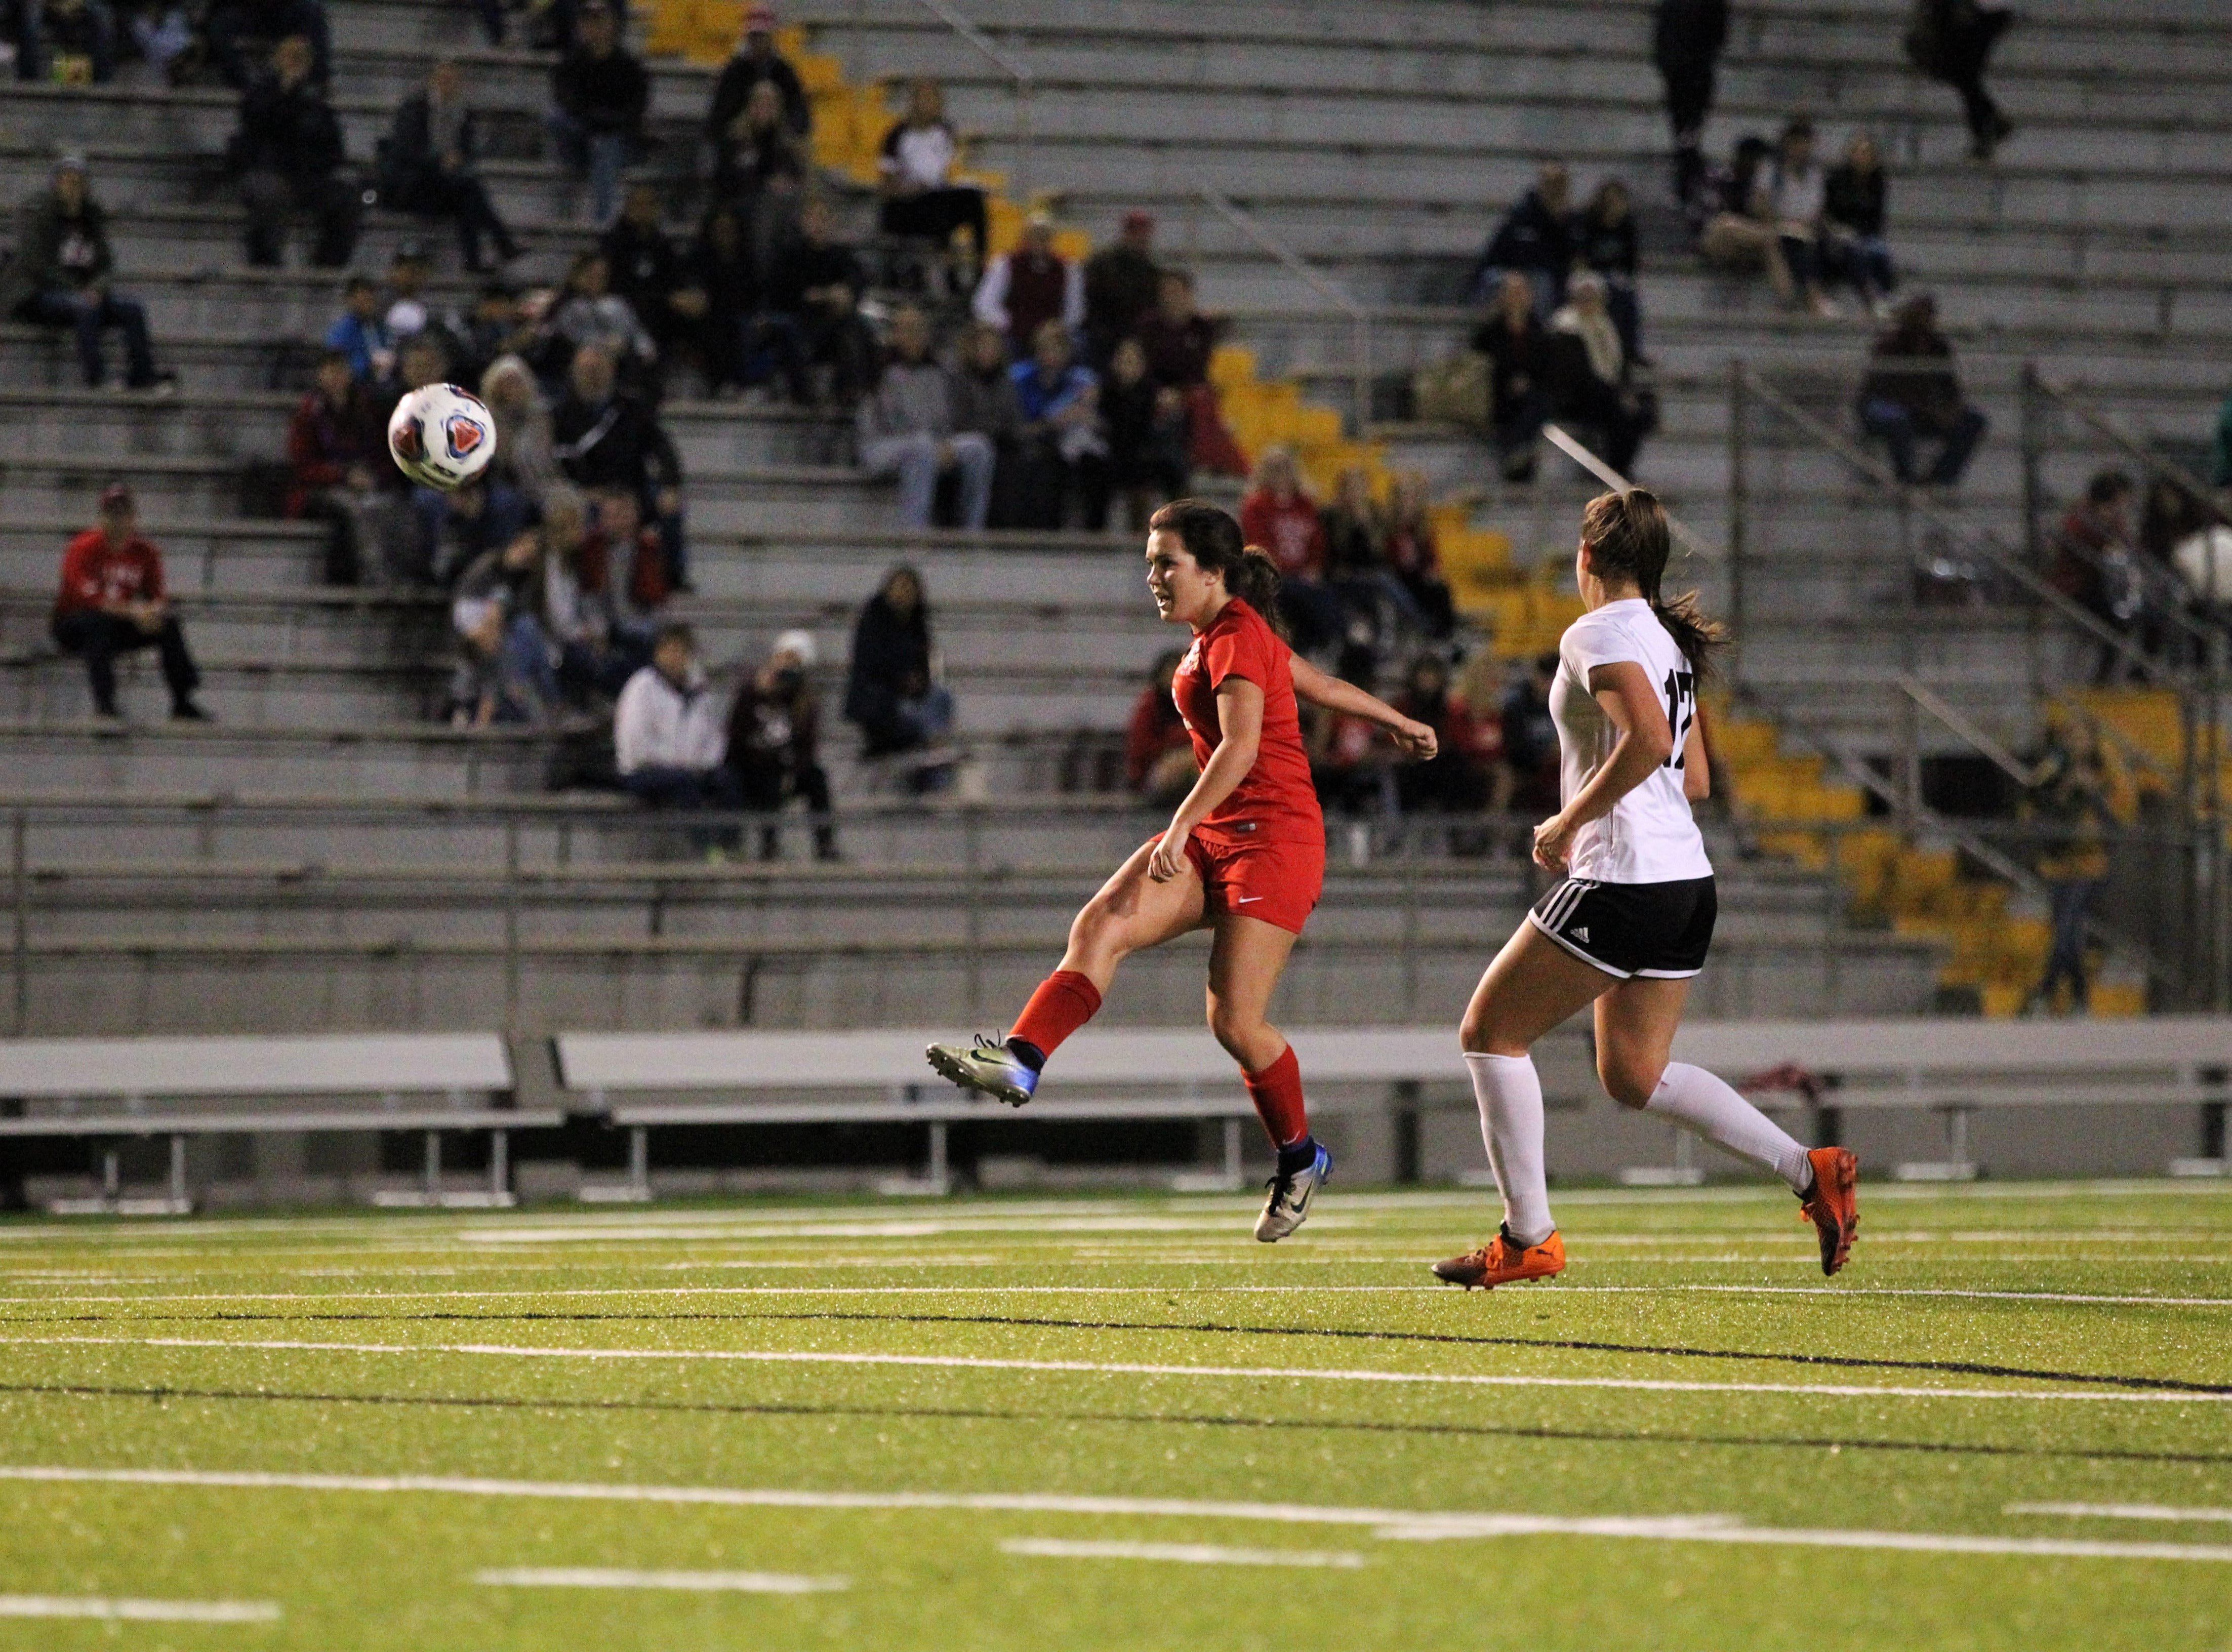 Leon's Ashley Fink sends a pass upfield as Niceville's girls soccer team beat Leon 1-0 in a Region 1-4A semifinal at Gene Cox Stadium on Jan. 8, 2019.